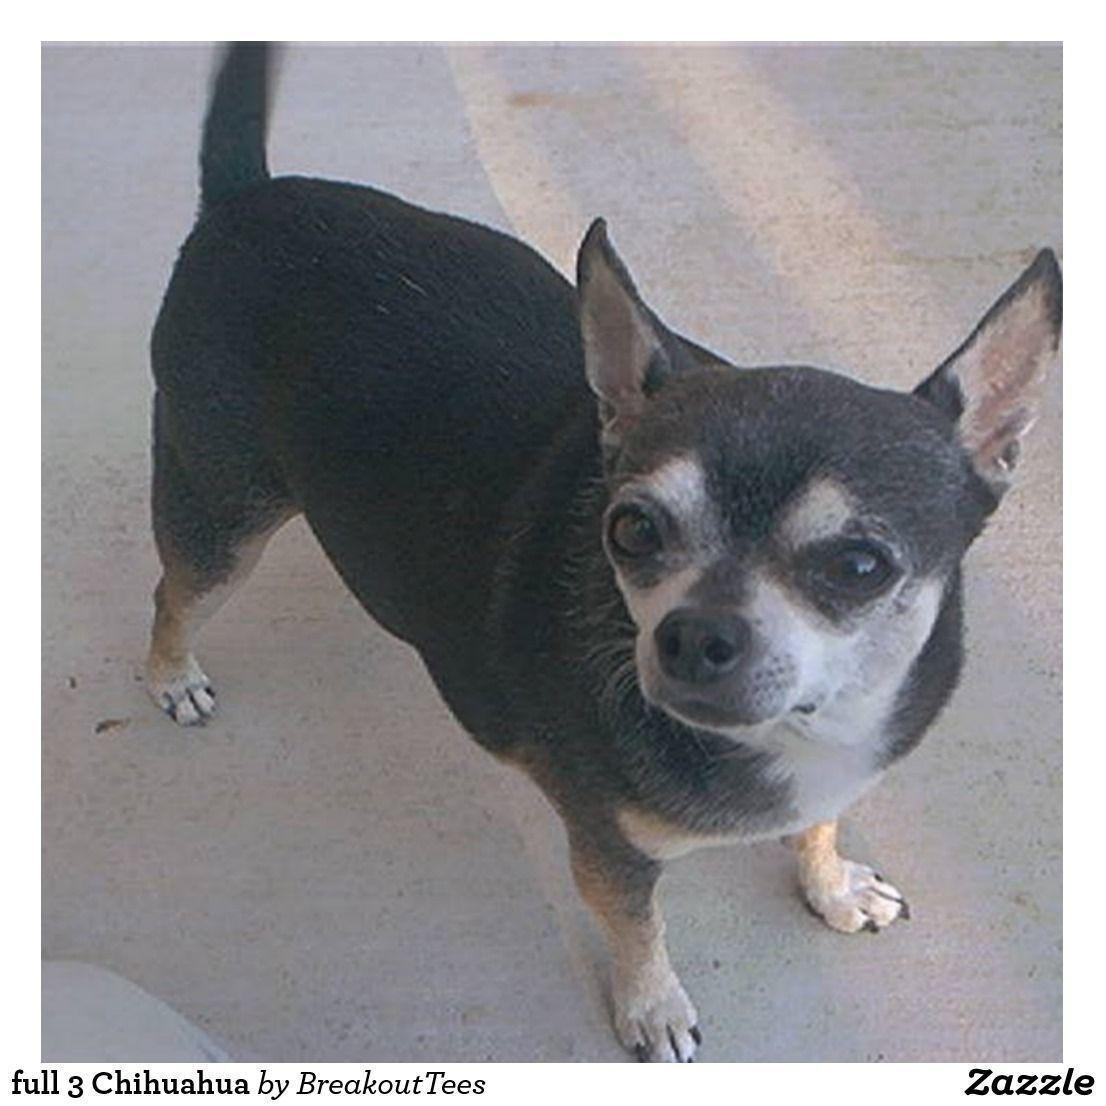 full 3 Chihuahua chihuahua Chihuahua, Chihuahua dogs